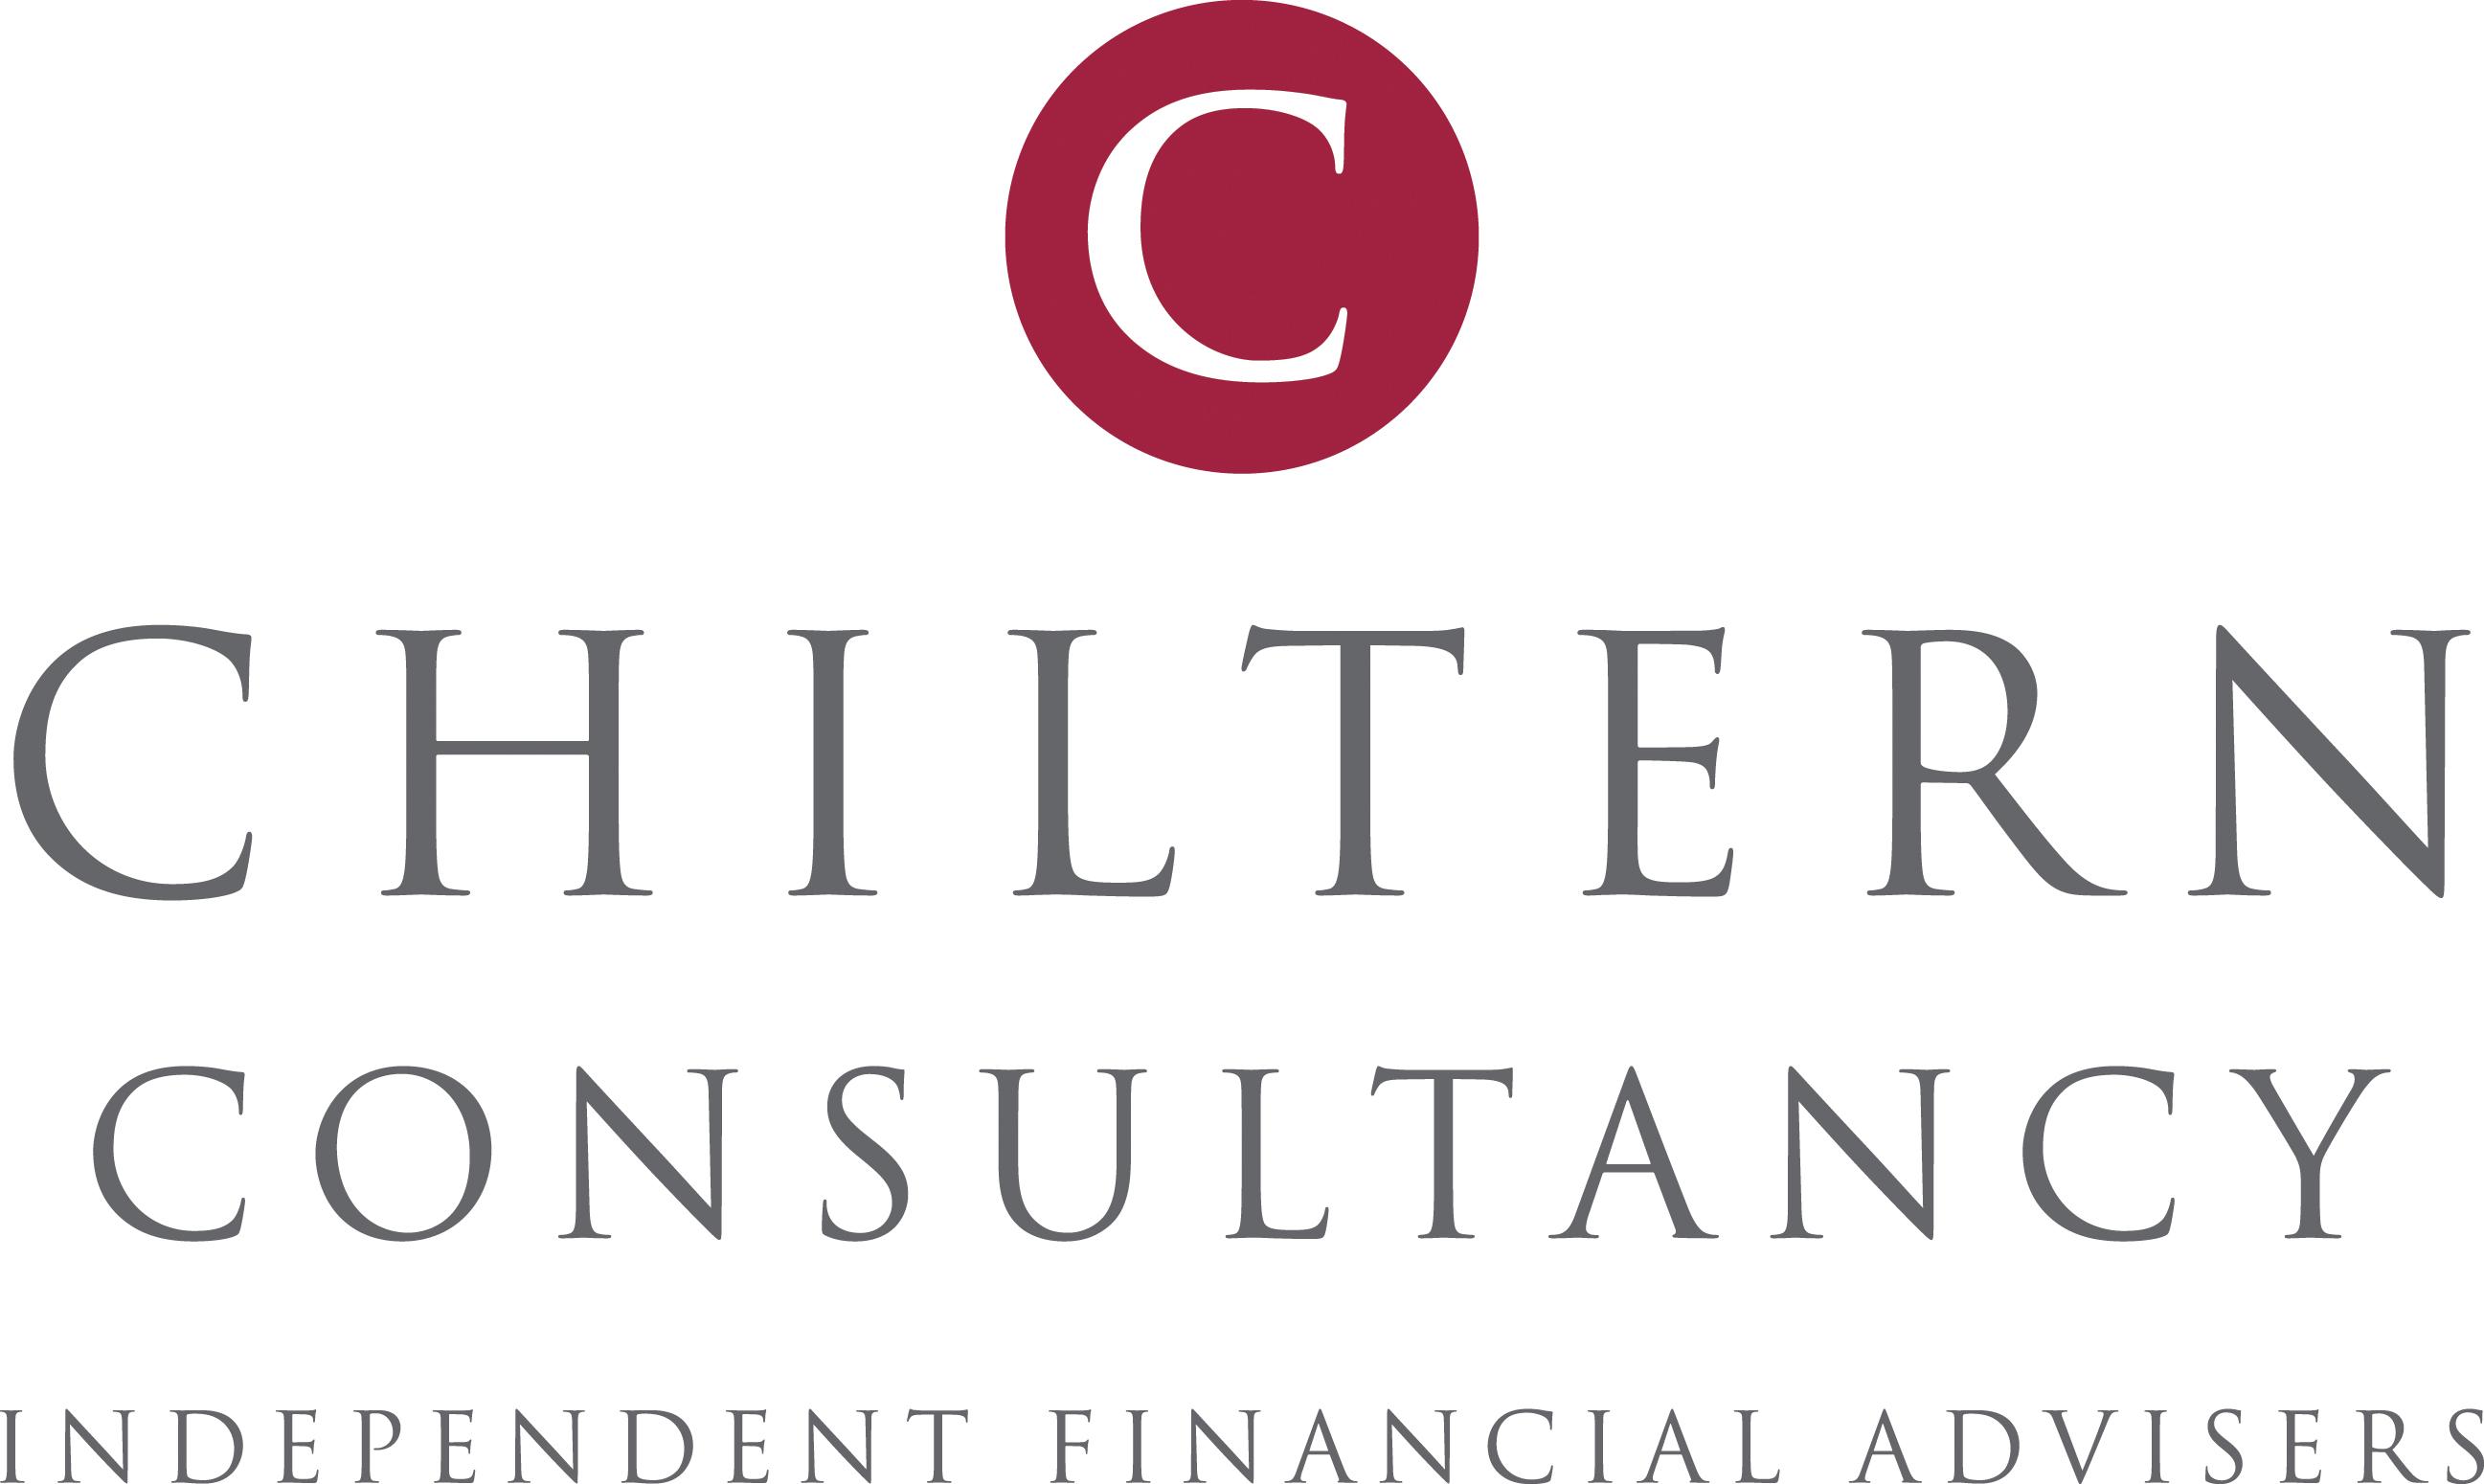 Chiltern Consultancy Ltd